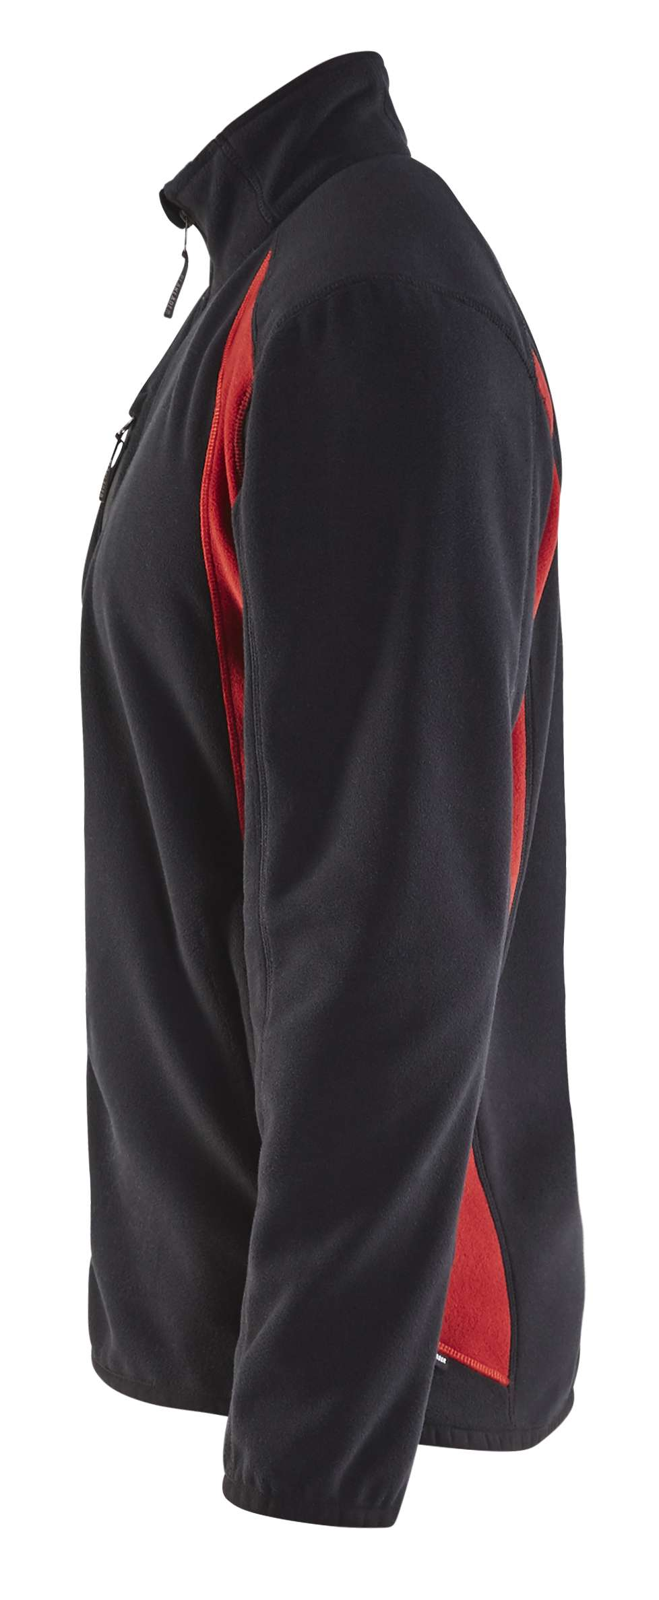 Blaklader Fleece vesten 47302510 zwart-rood(9956)